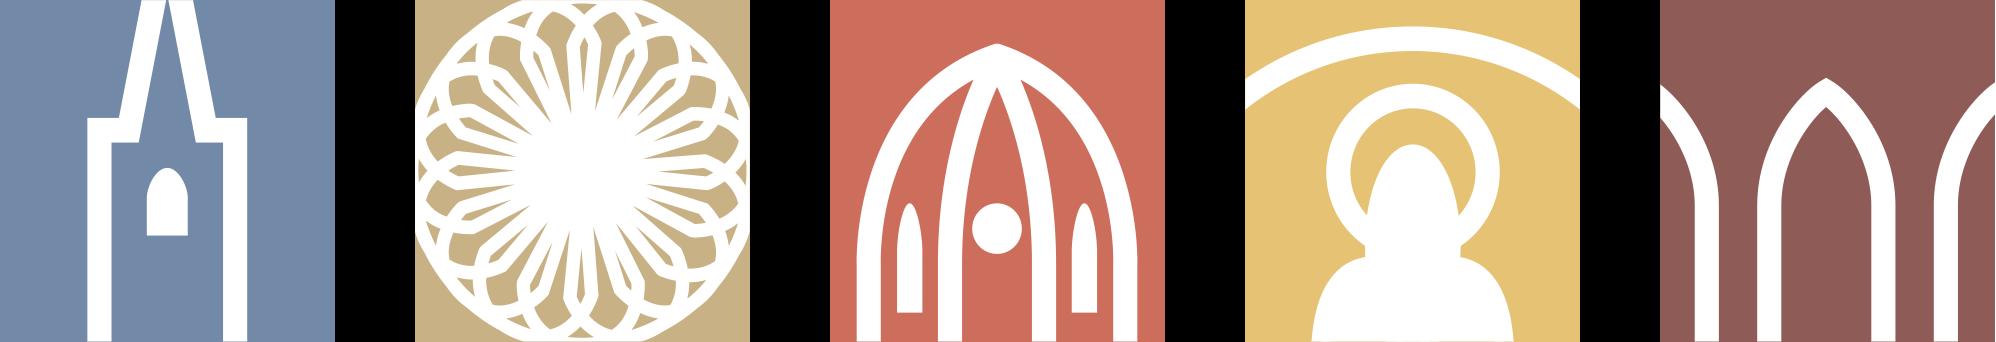 KFDS - Collegiata Case Study Iconografia